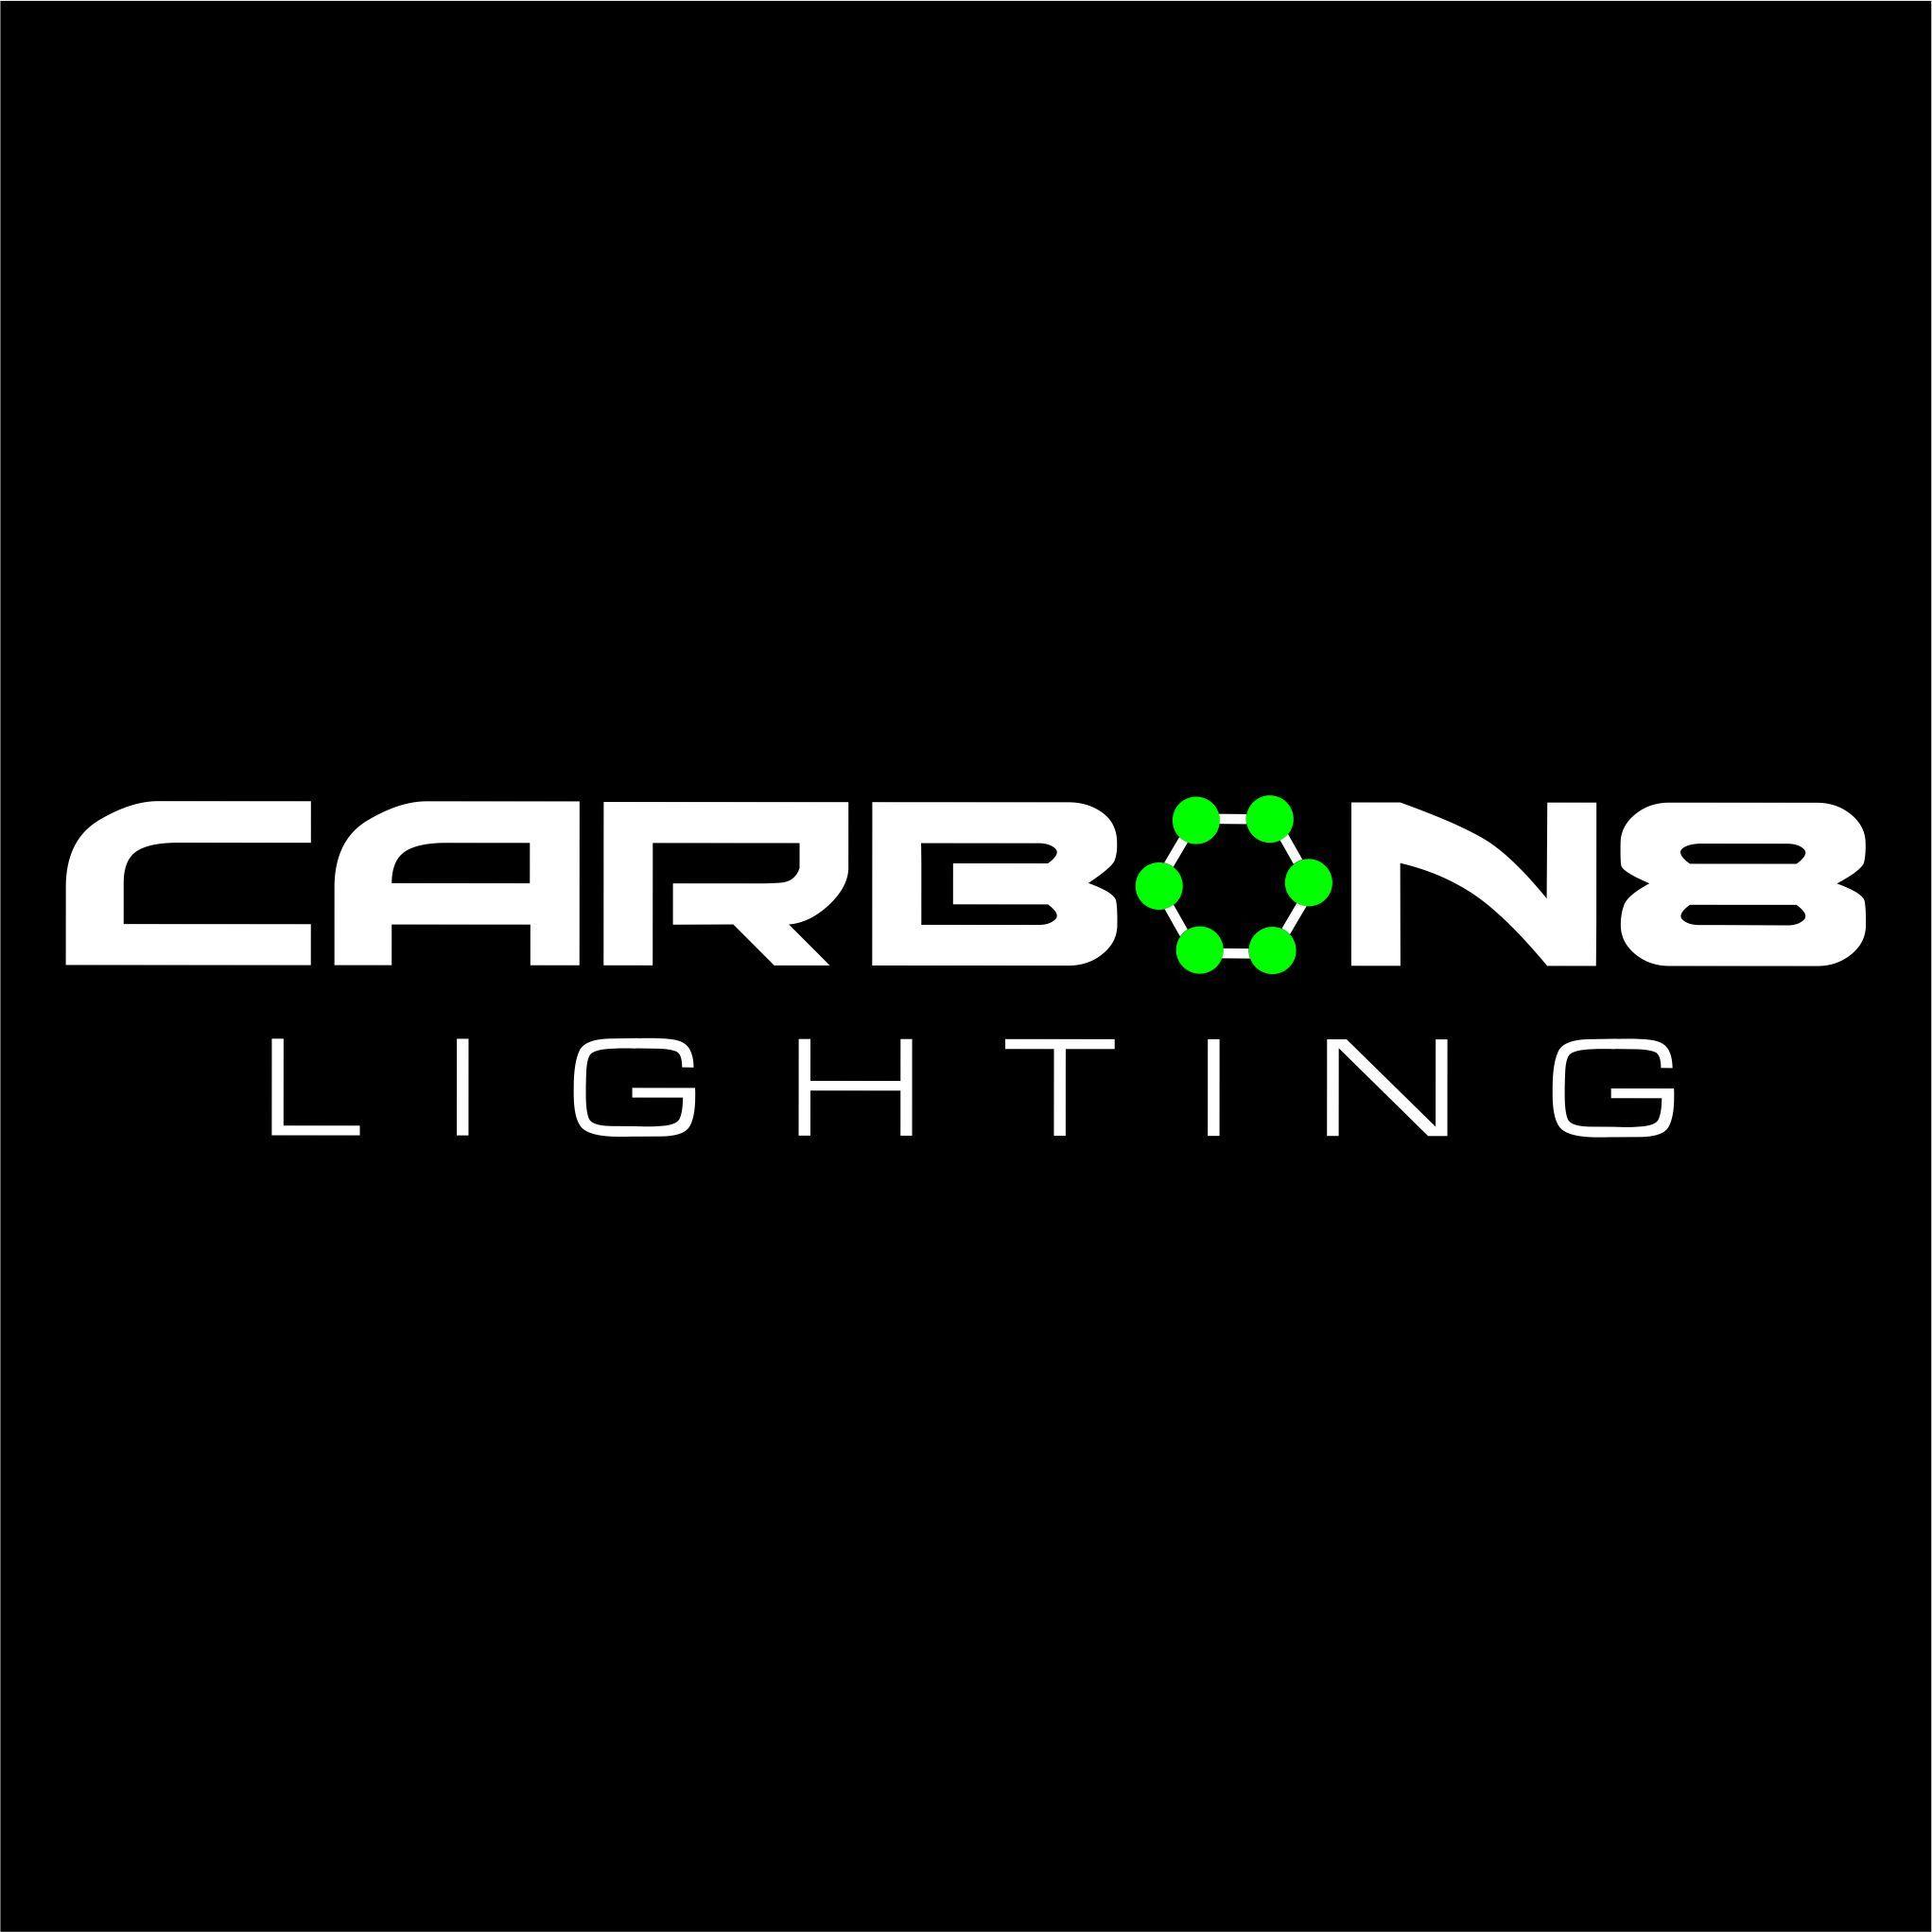 Carbon 8 Lighting